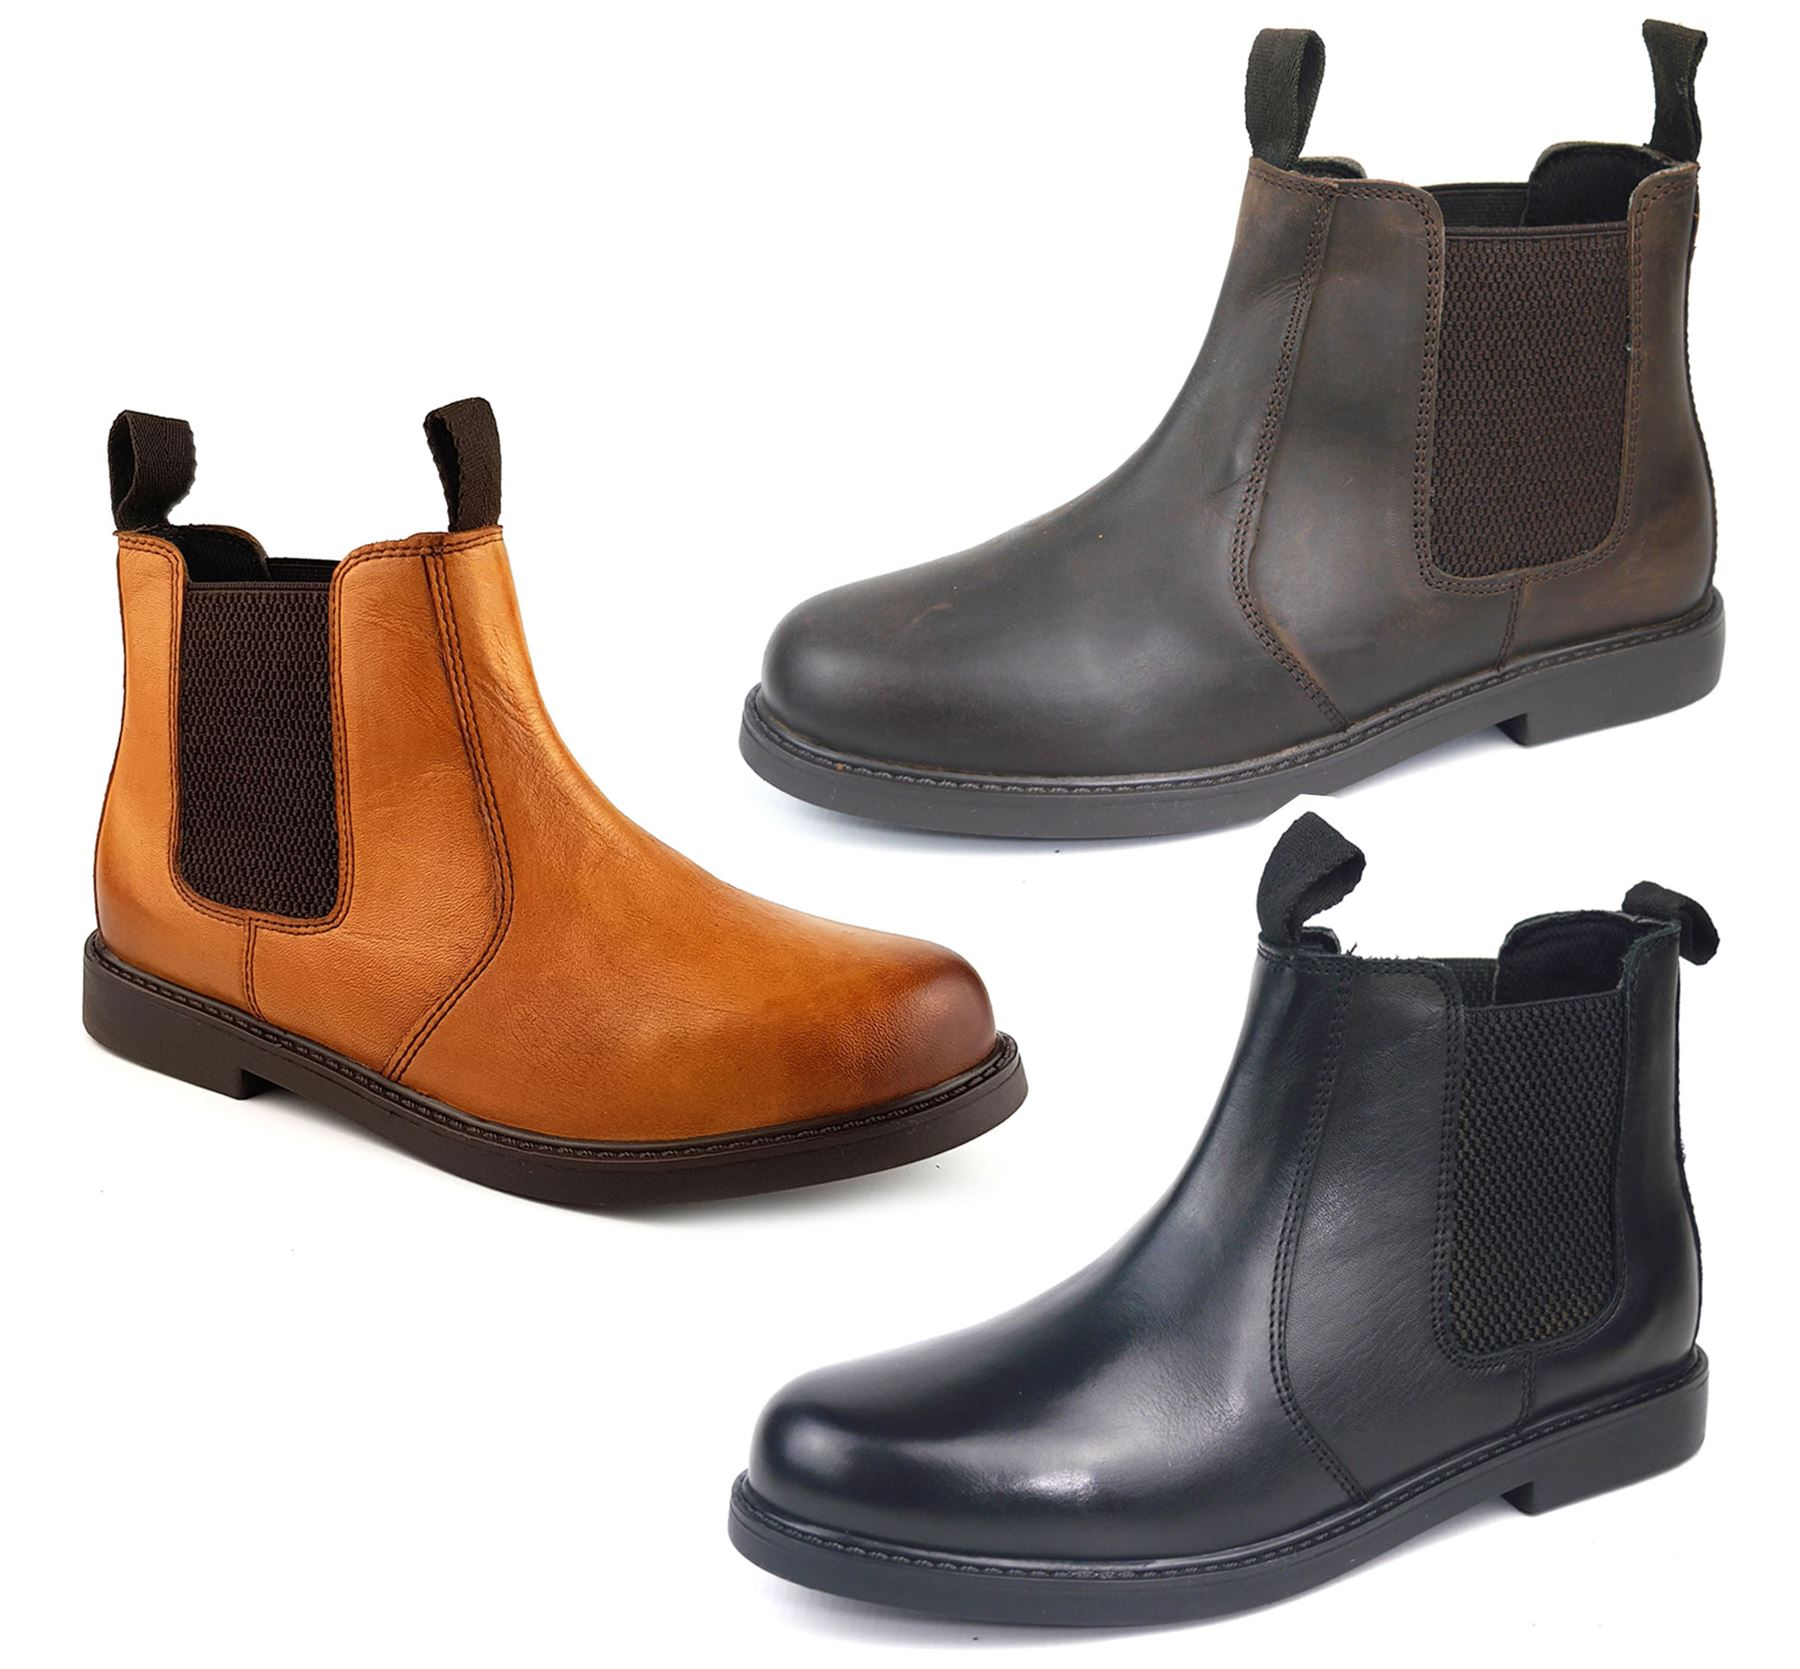 Frank James Cheltenham Boys Girls Brogue Chelsea Leather Jodphur Boots